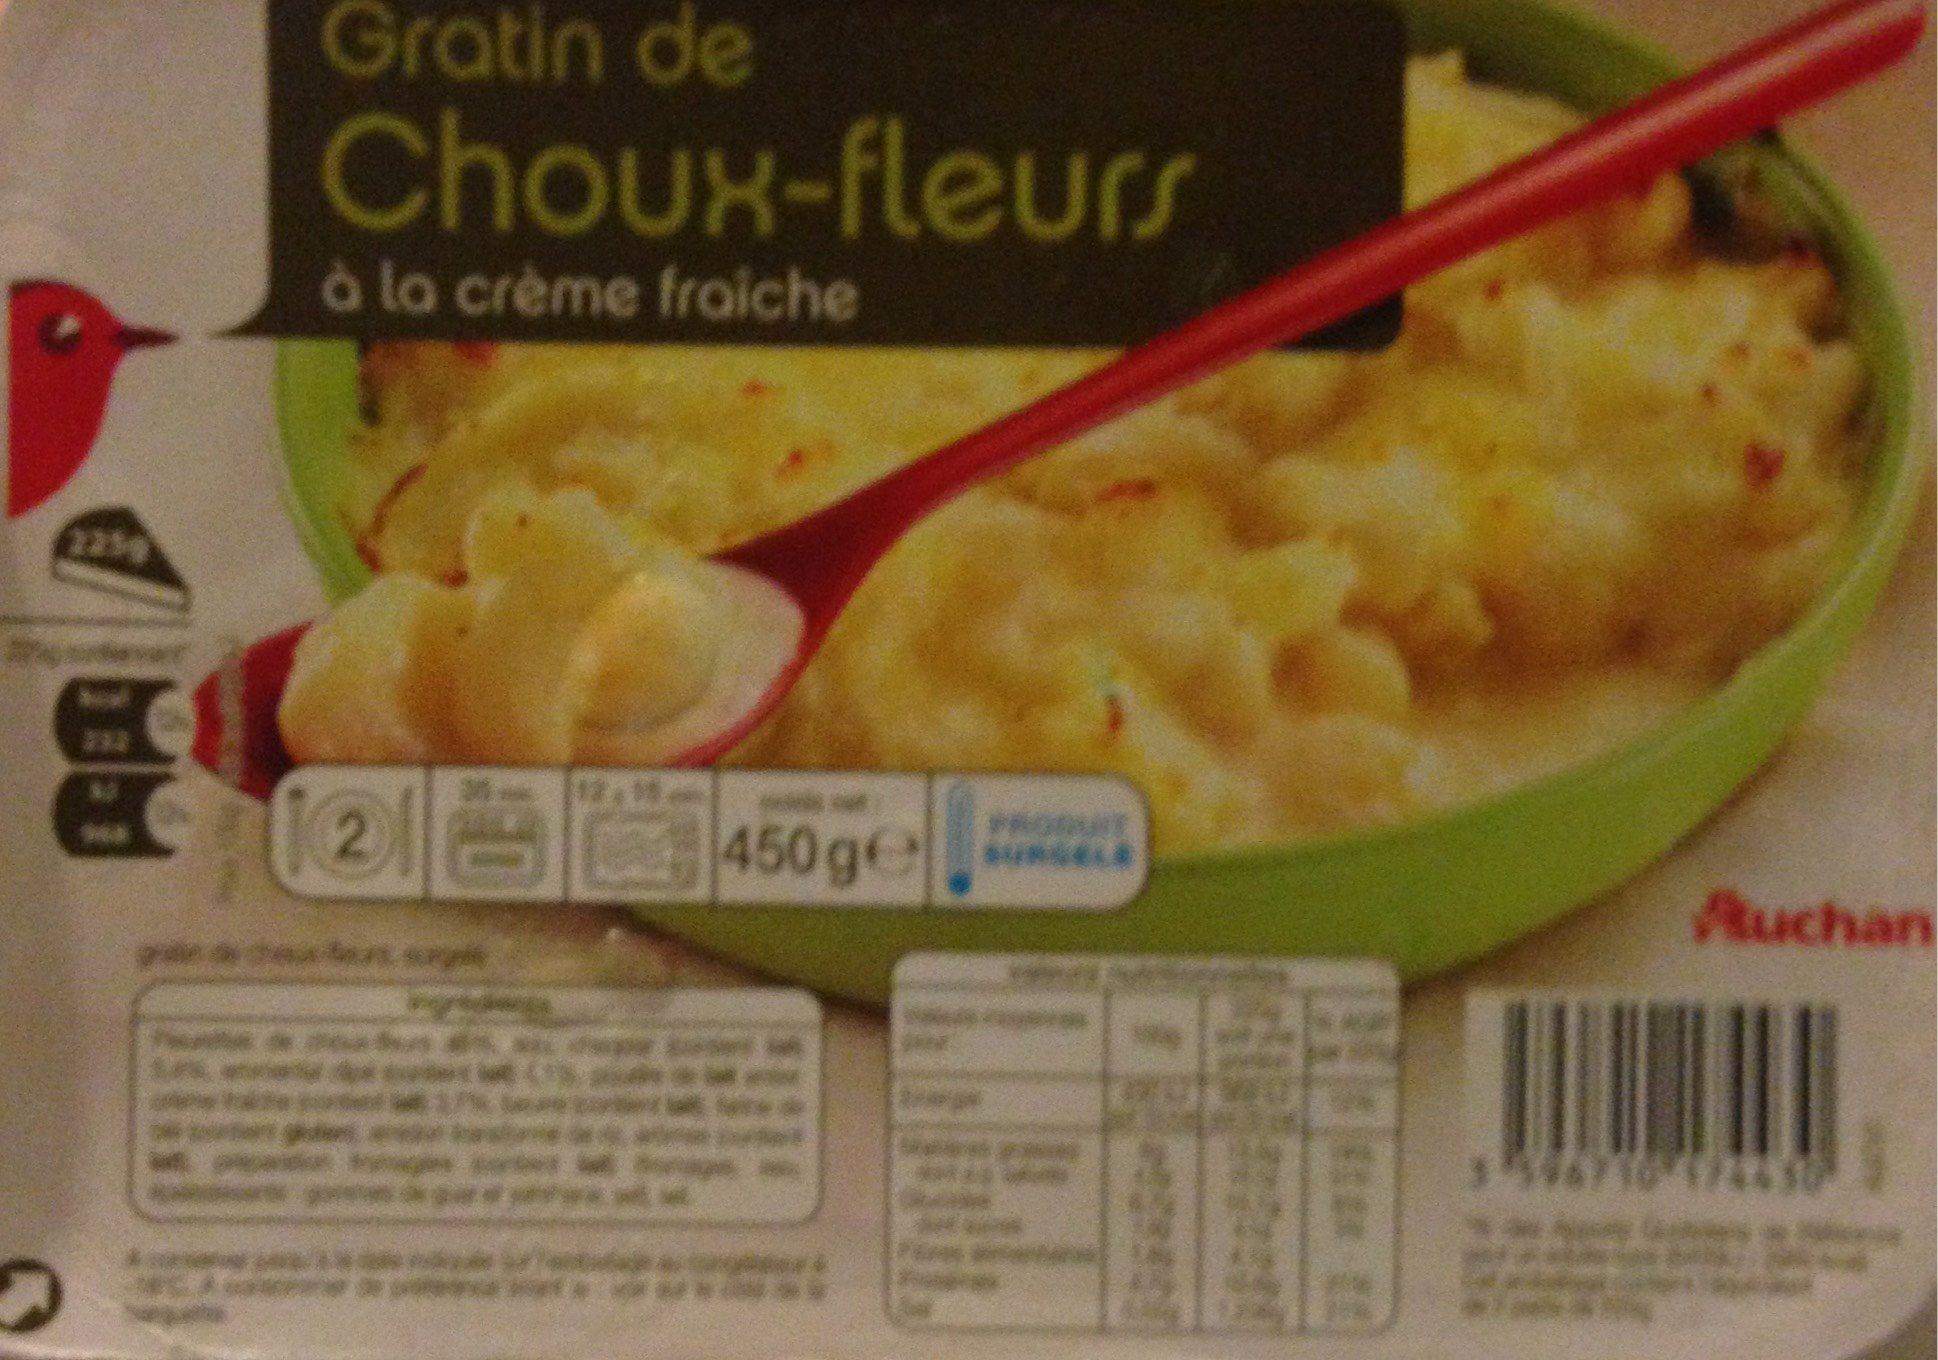 Gratin De Choux Fleur A La Creme Fraiche Auchan